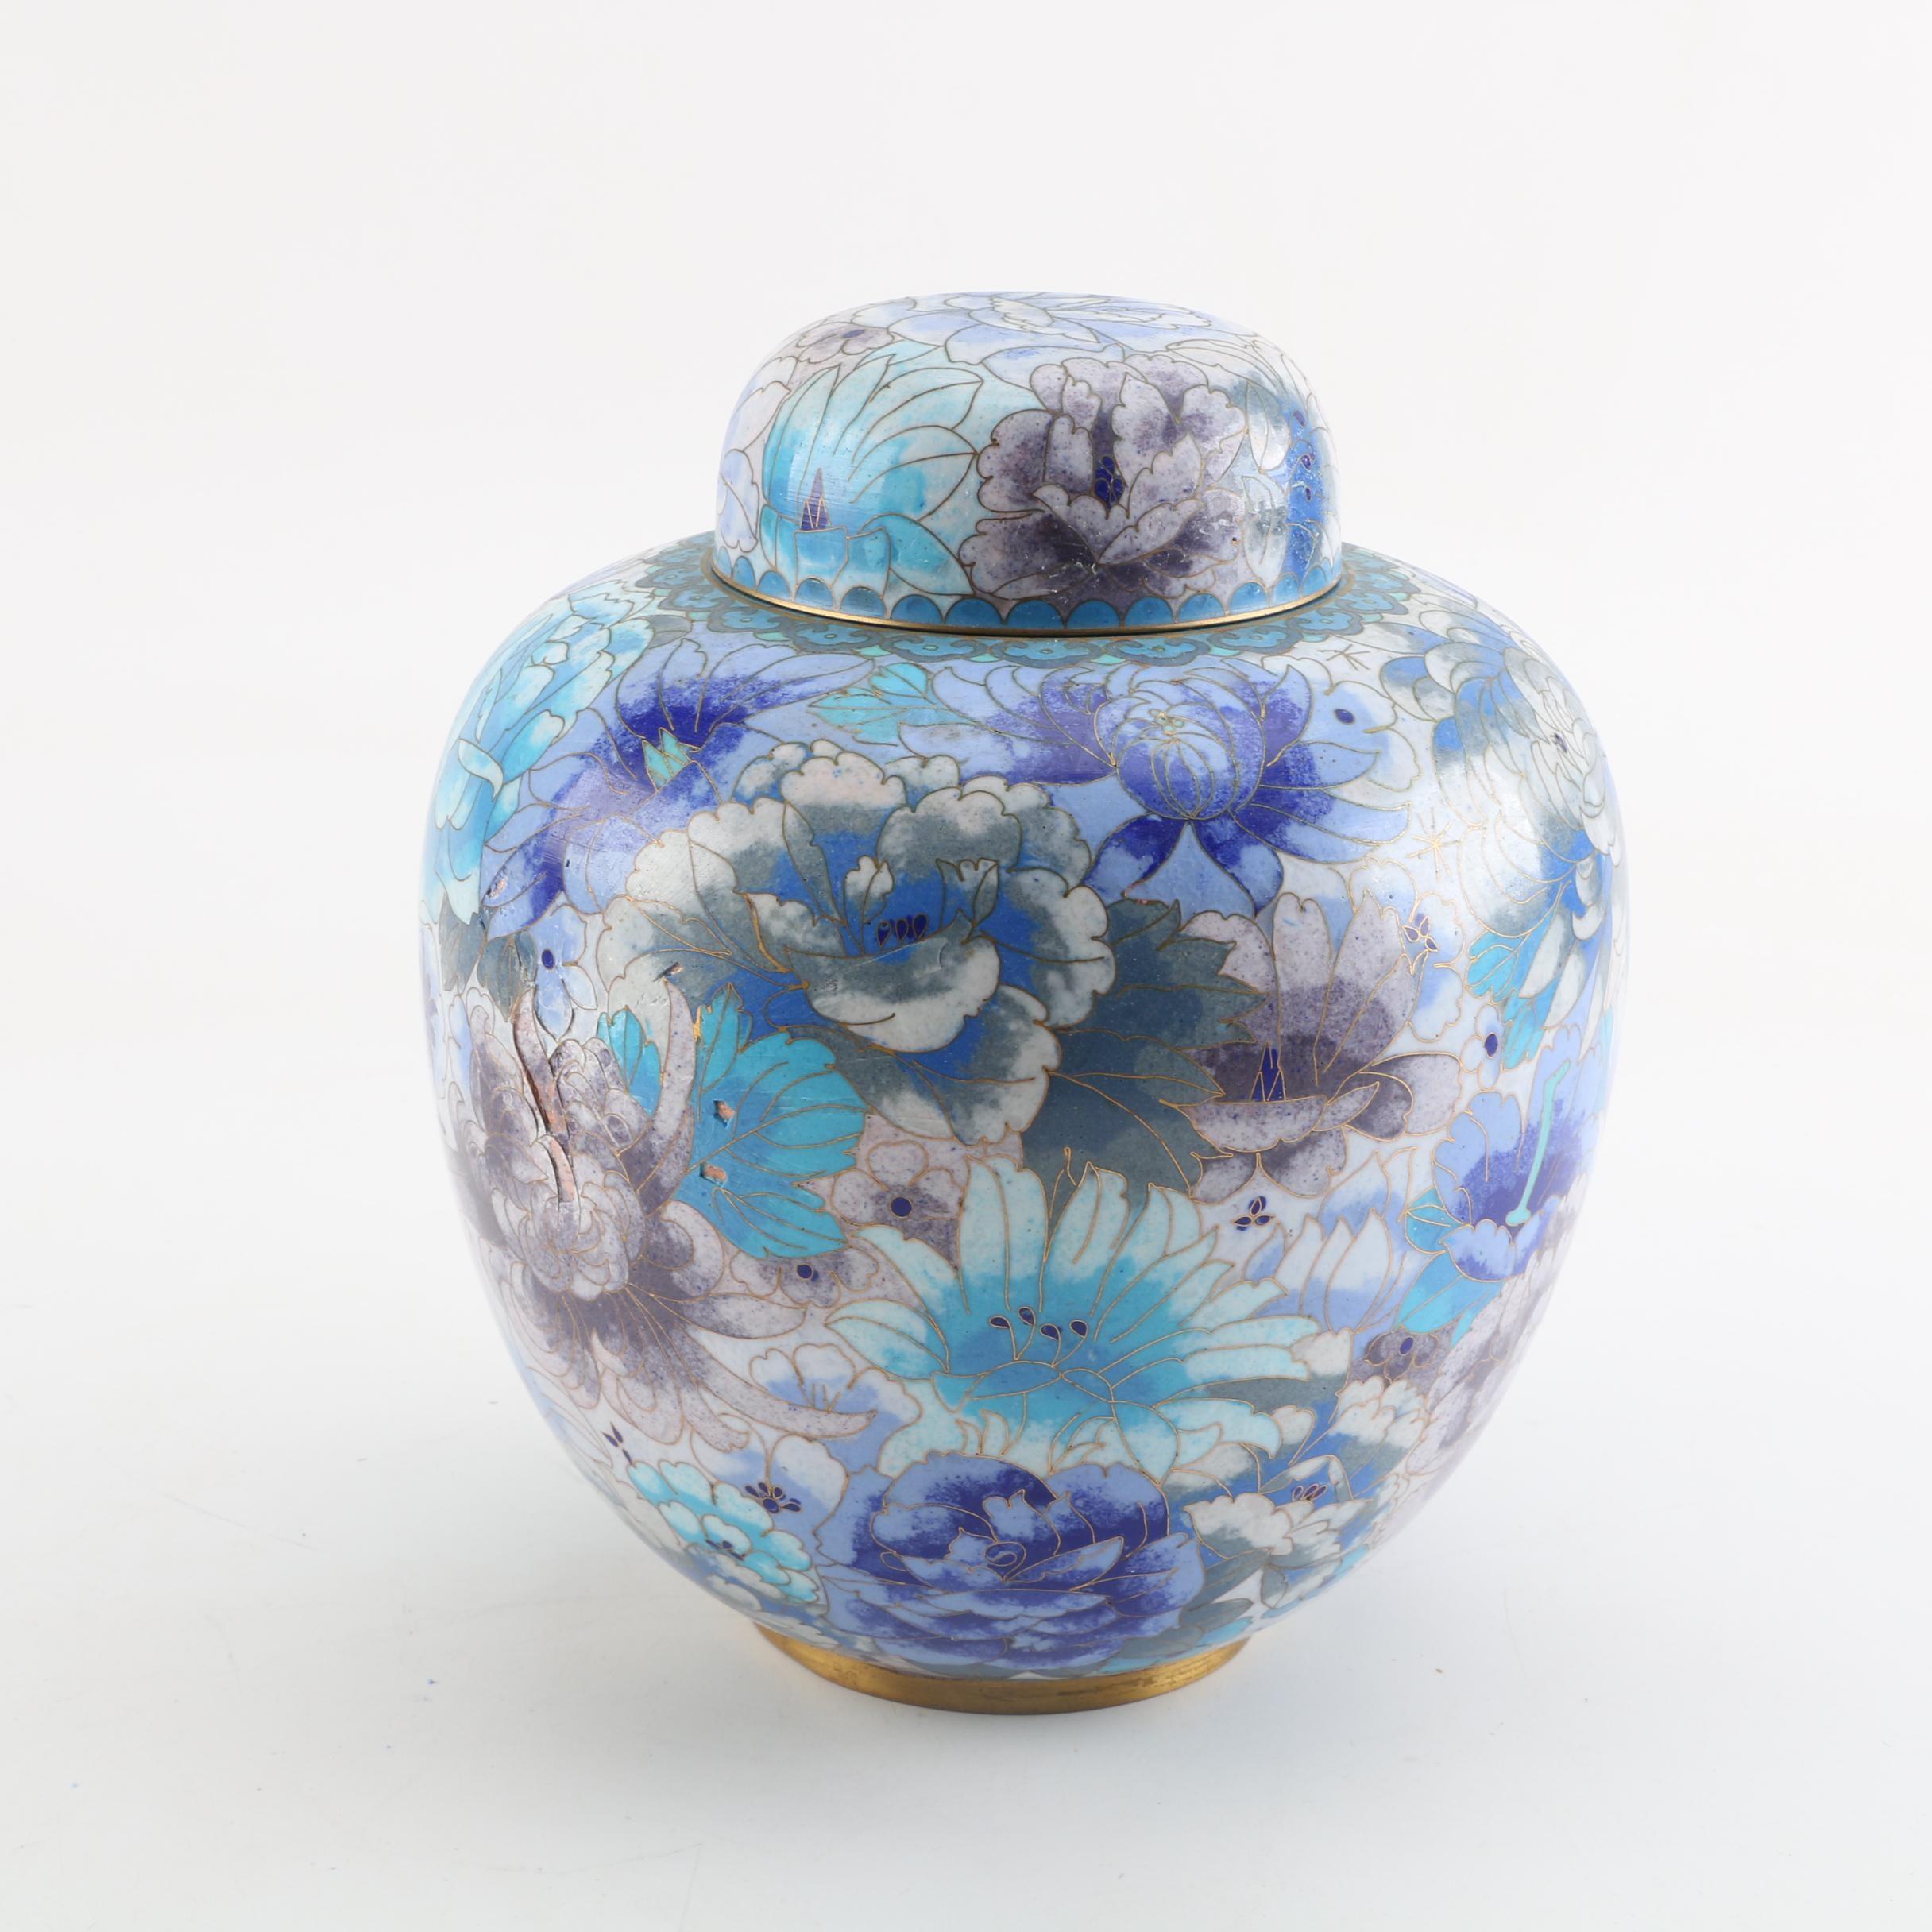 Chinese Cloisonné Ginger Jar